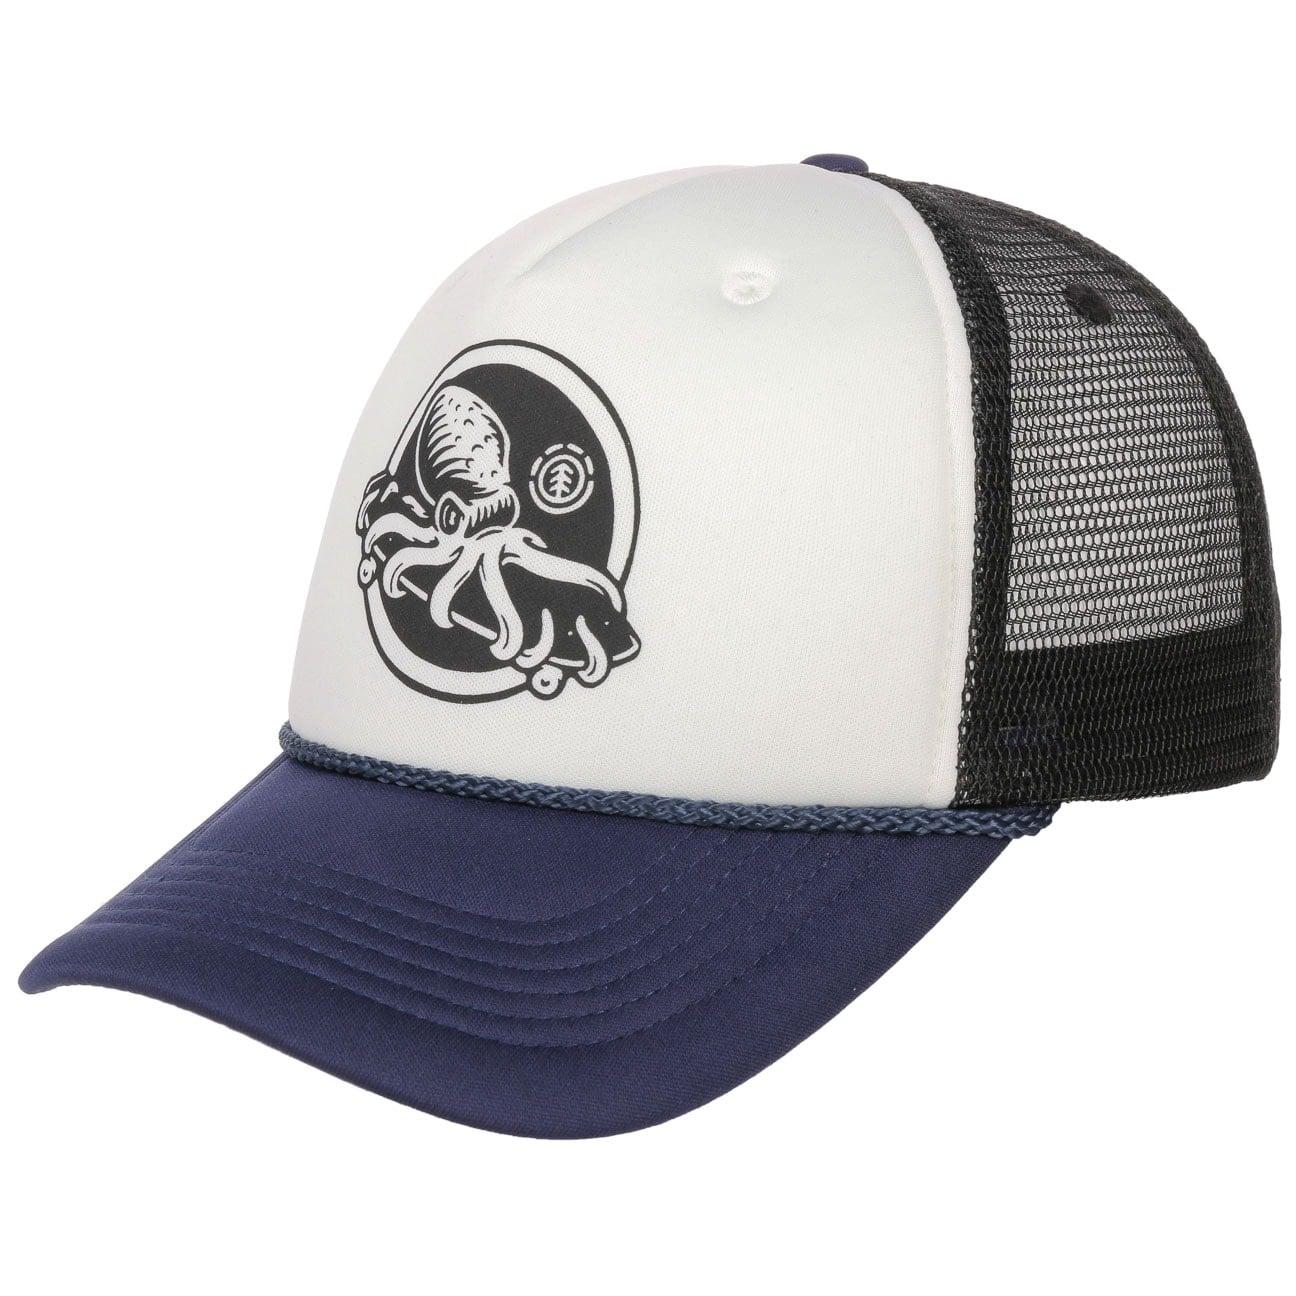 pioneers-mesh-cap-by-element-baseballcap